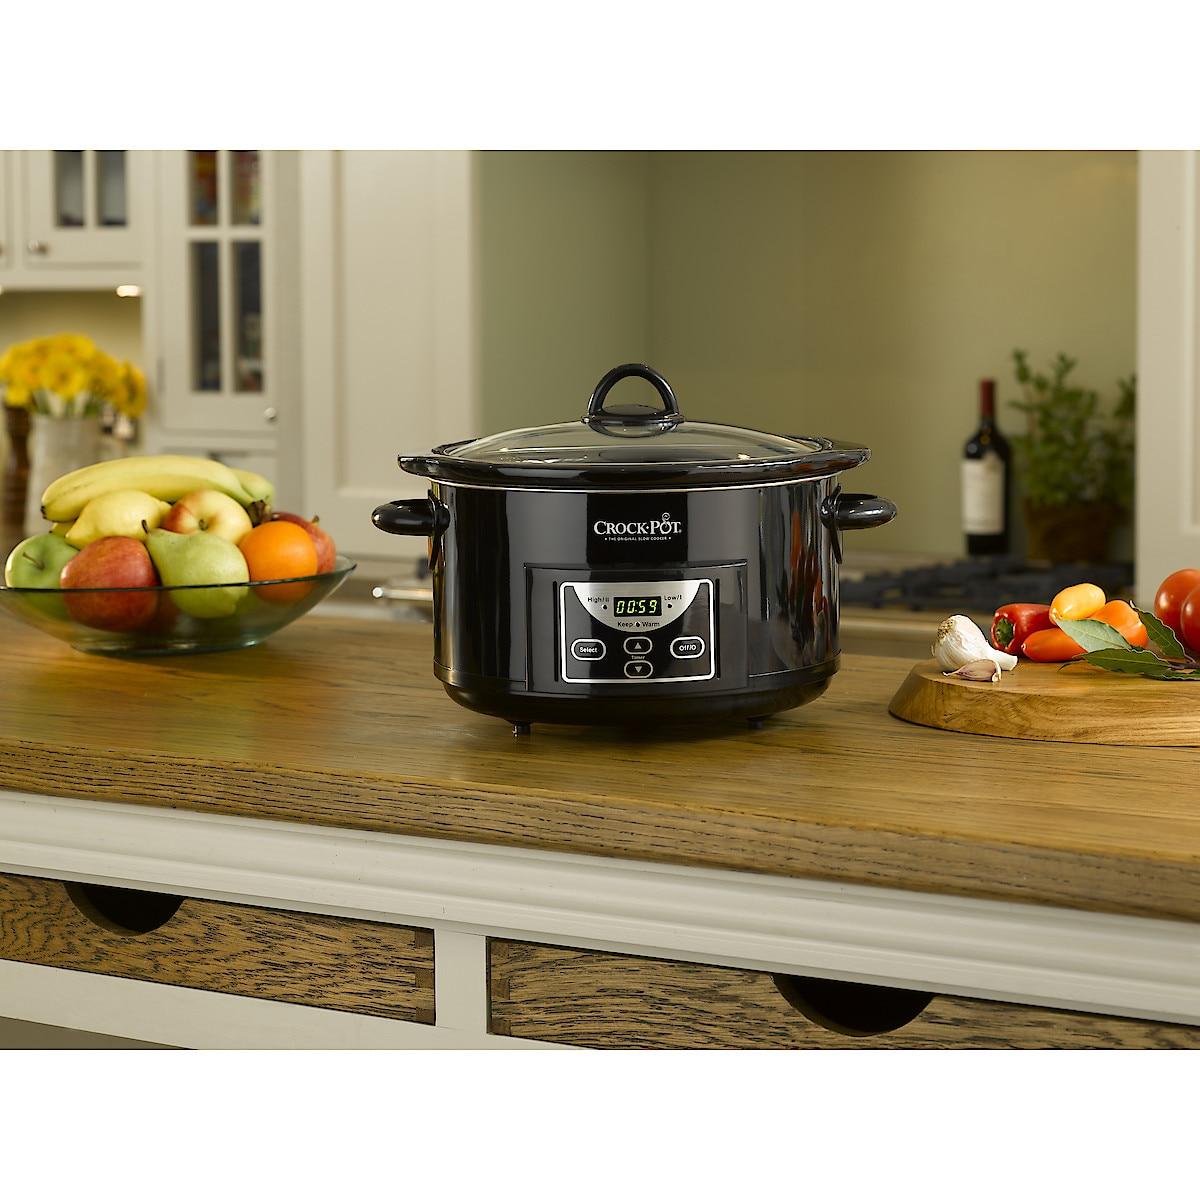 Slow cooker Crock-Pot 4,7 l